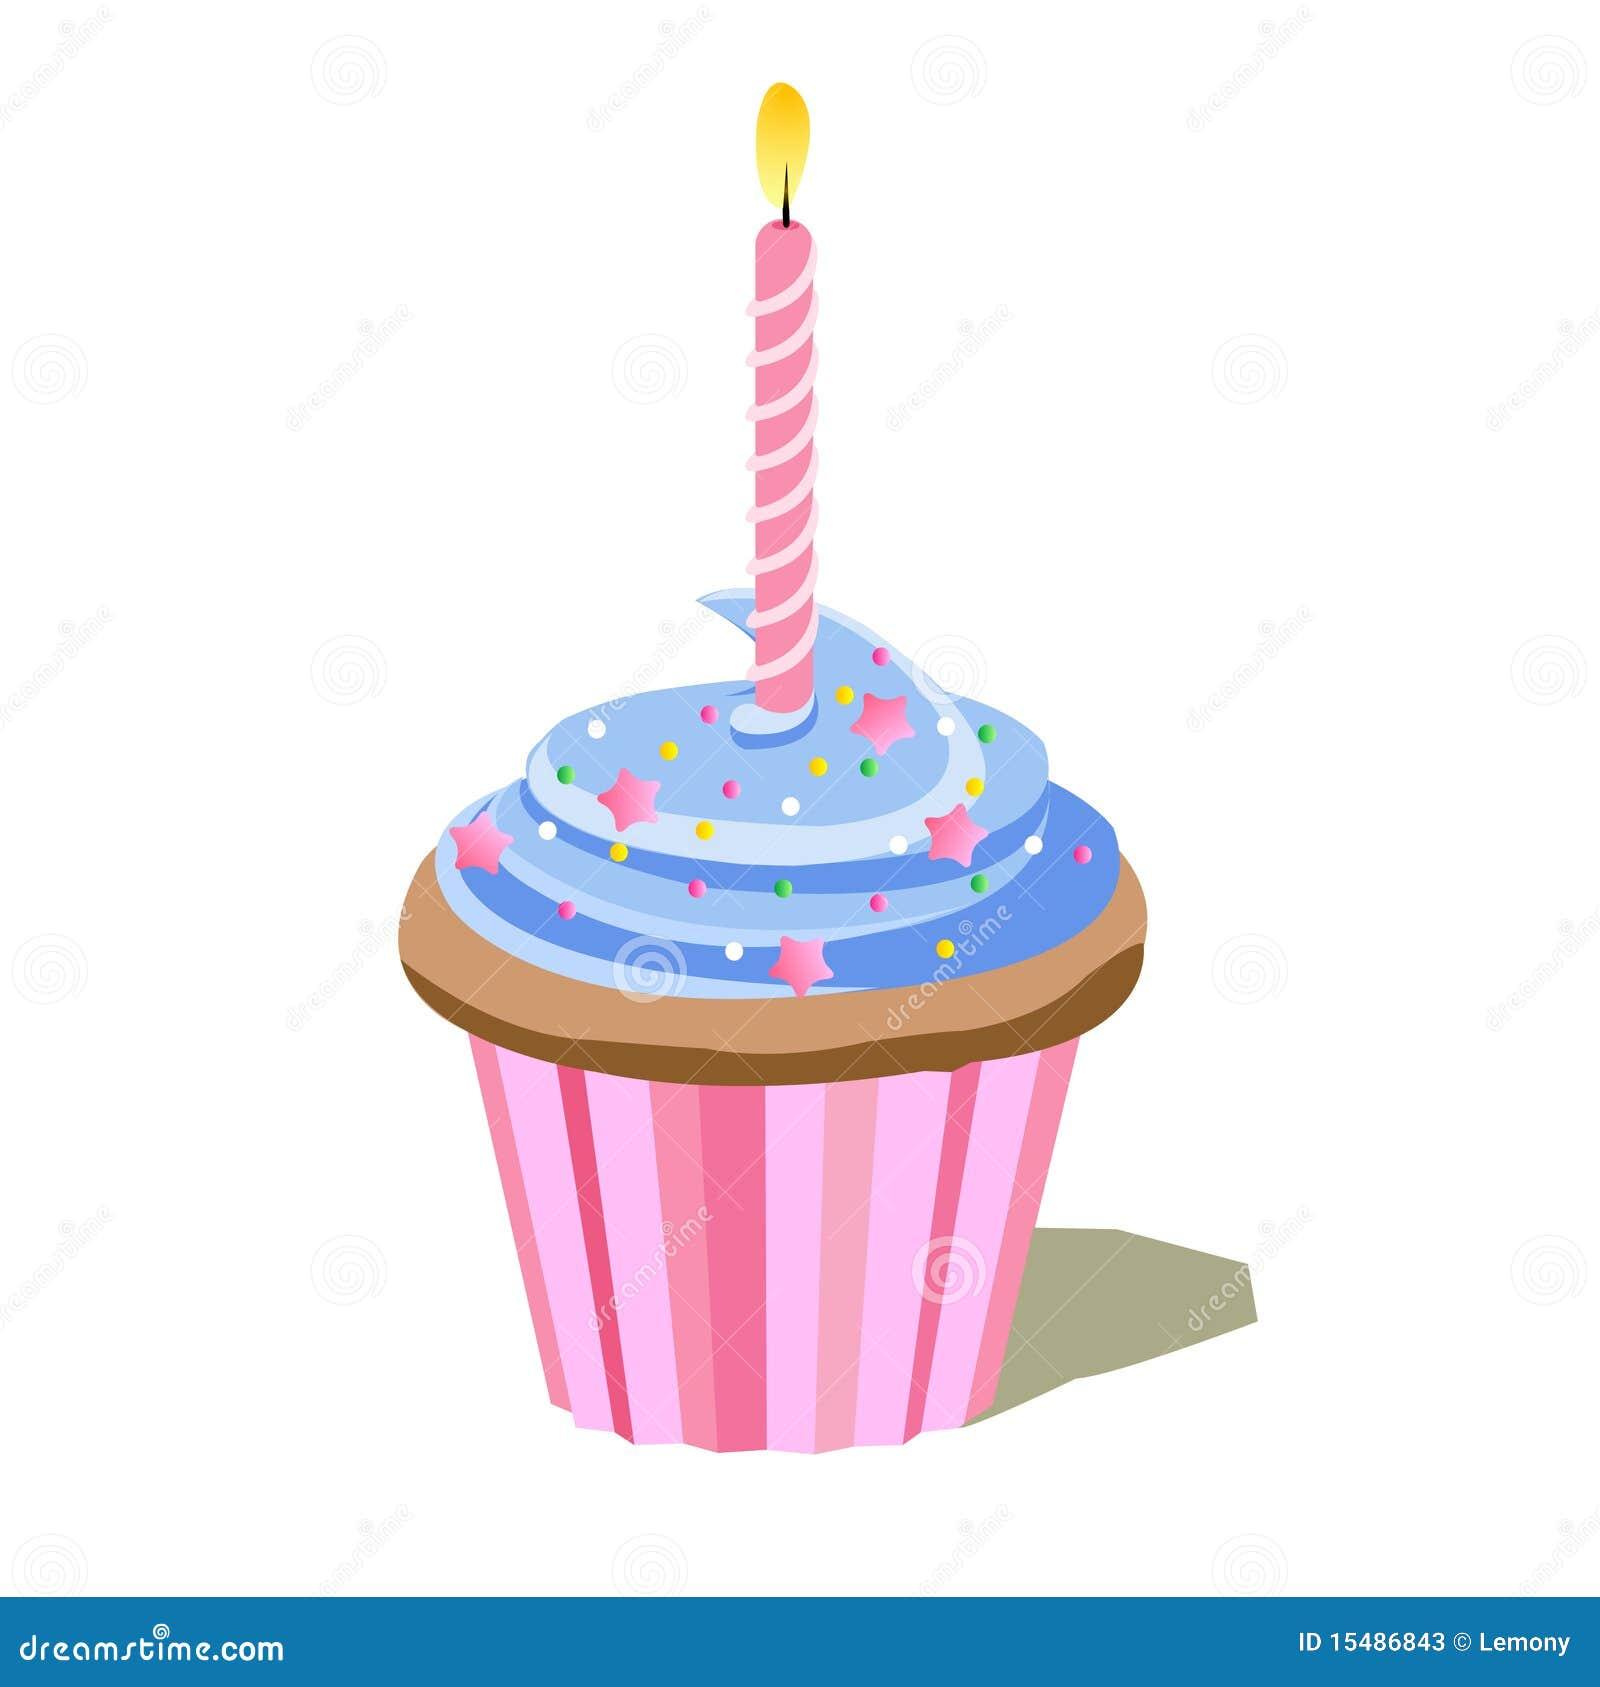 Royalty Free Birthday Cake Images Blue